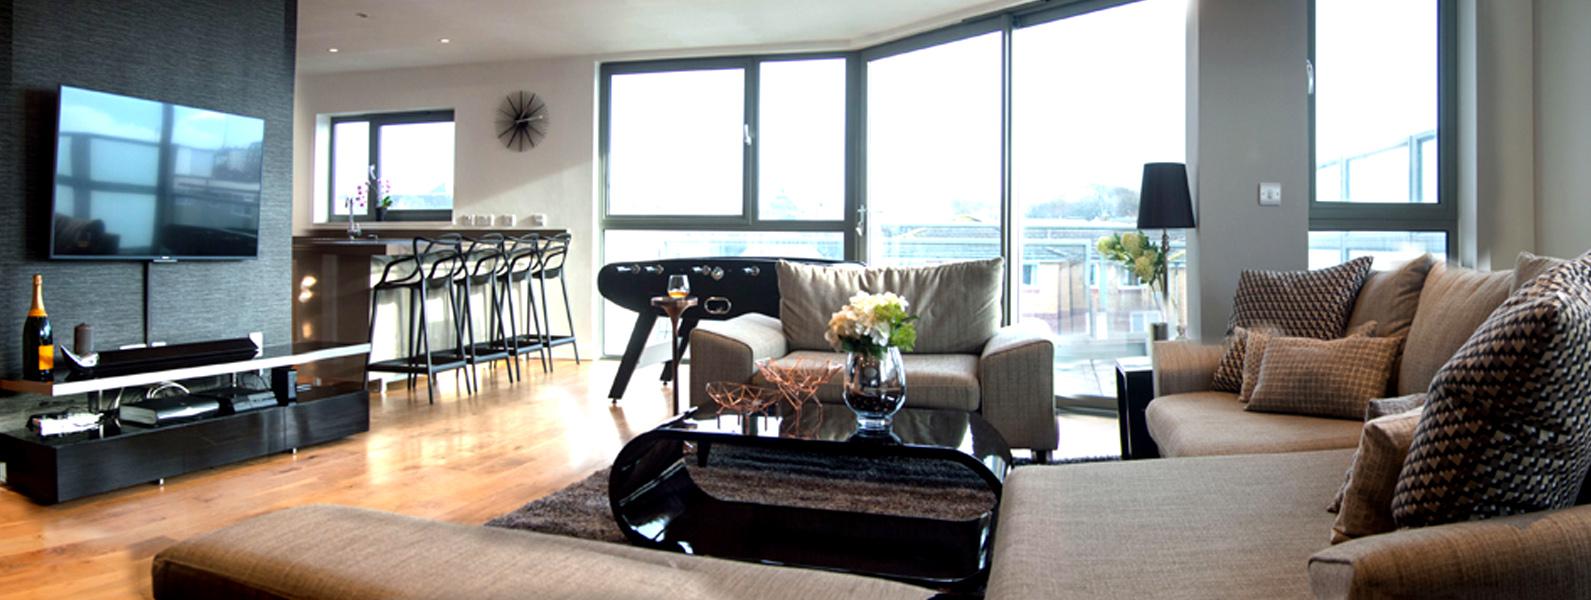 Living room pan 2